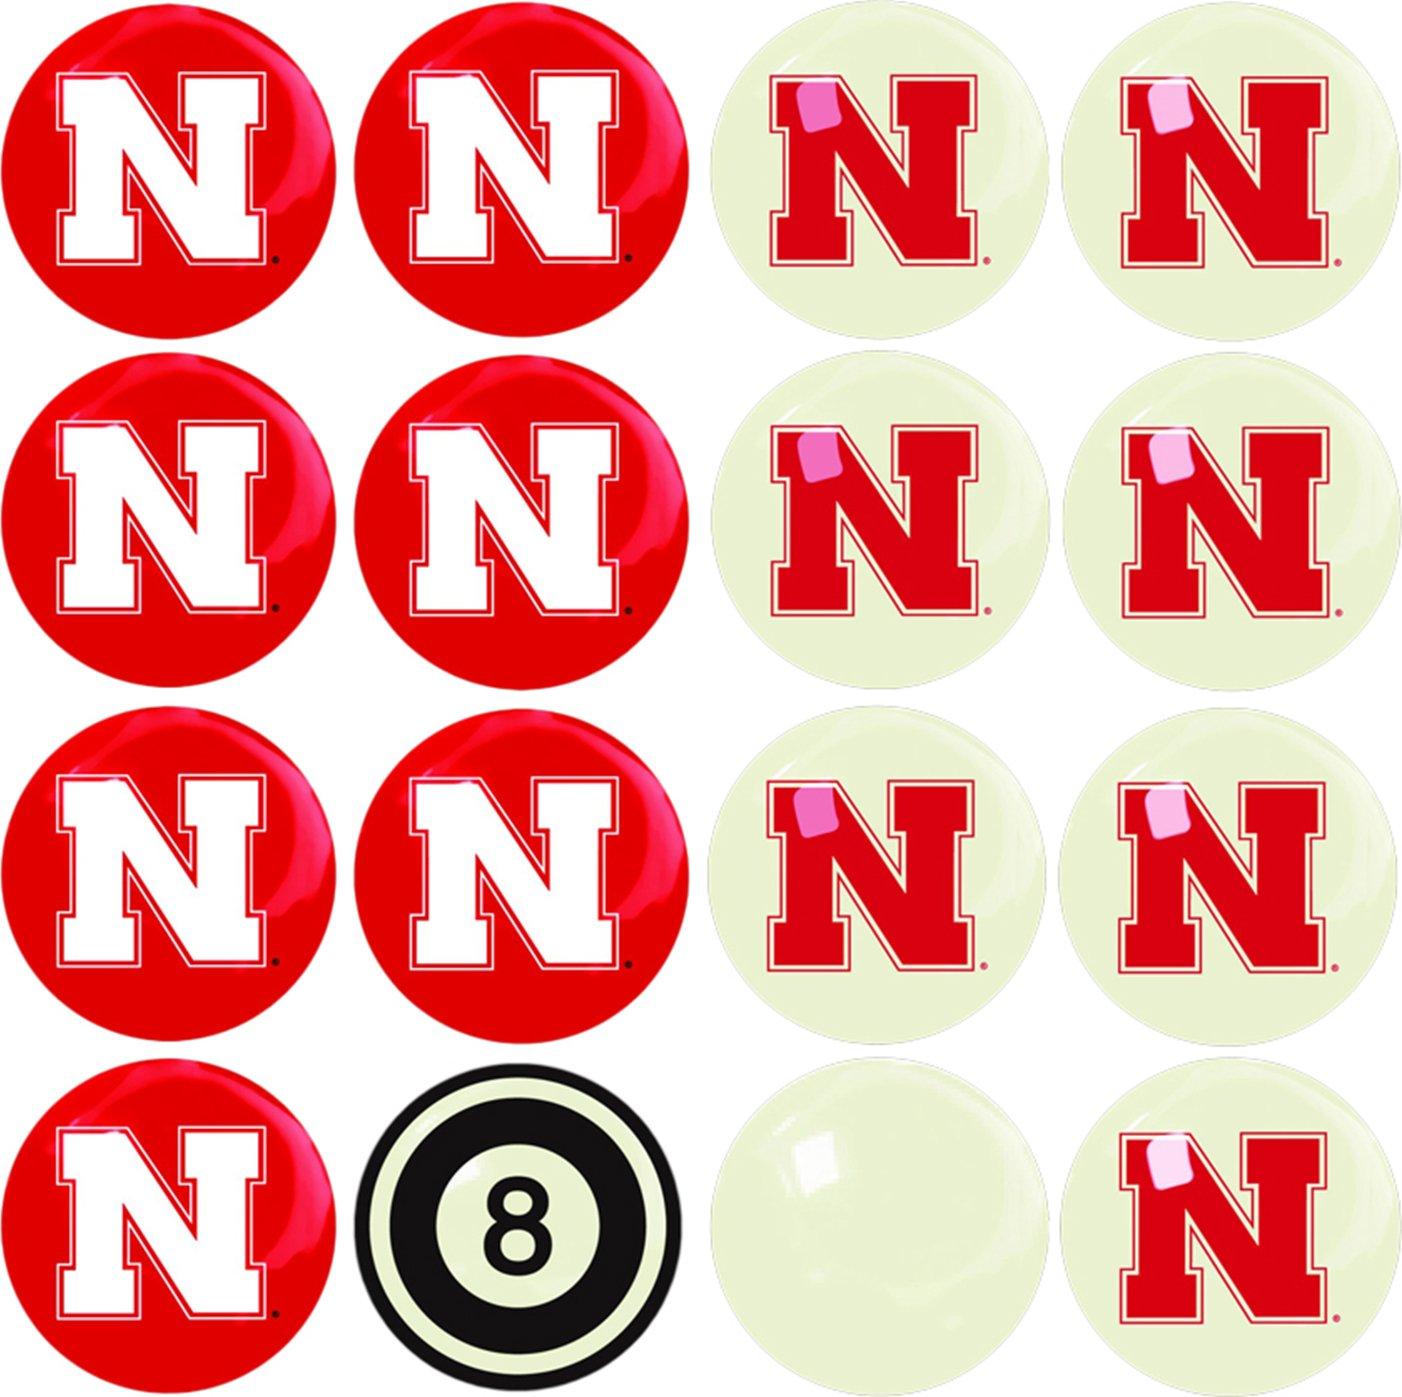 Imperial Officially Licensed NCAA Merchandise: Home vs. Away Billiard/Pool Balls, Complete 16 Ball Set, Nebraska Cornhuskers